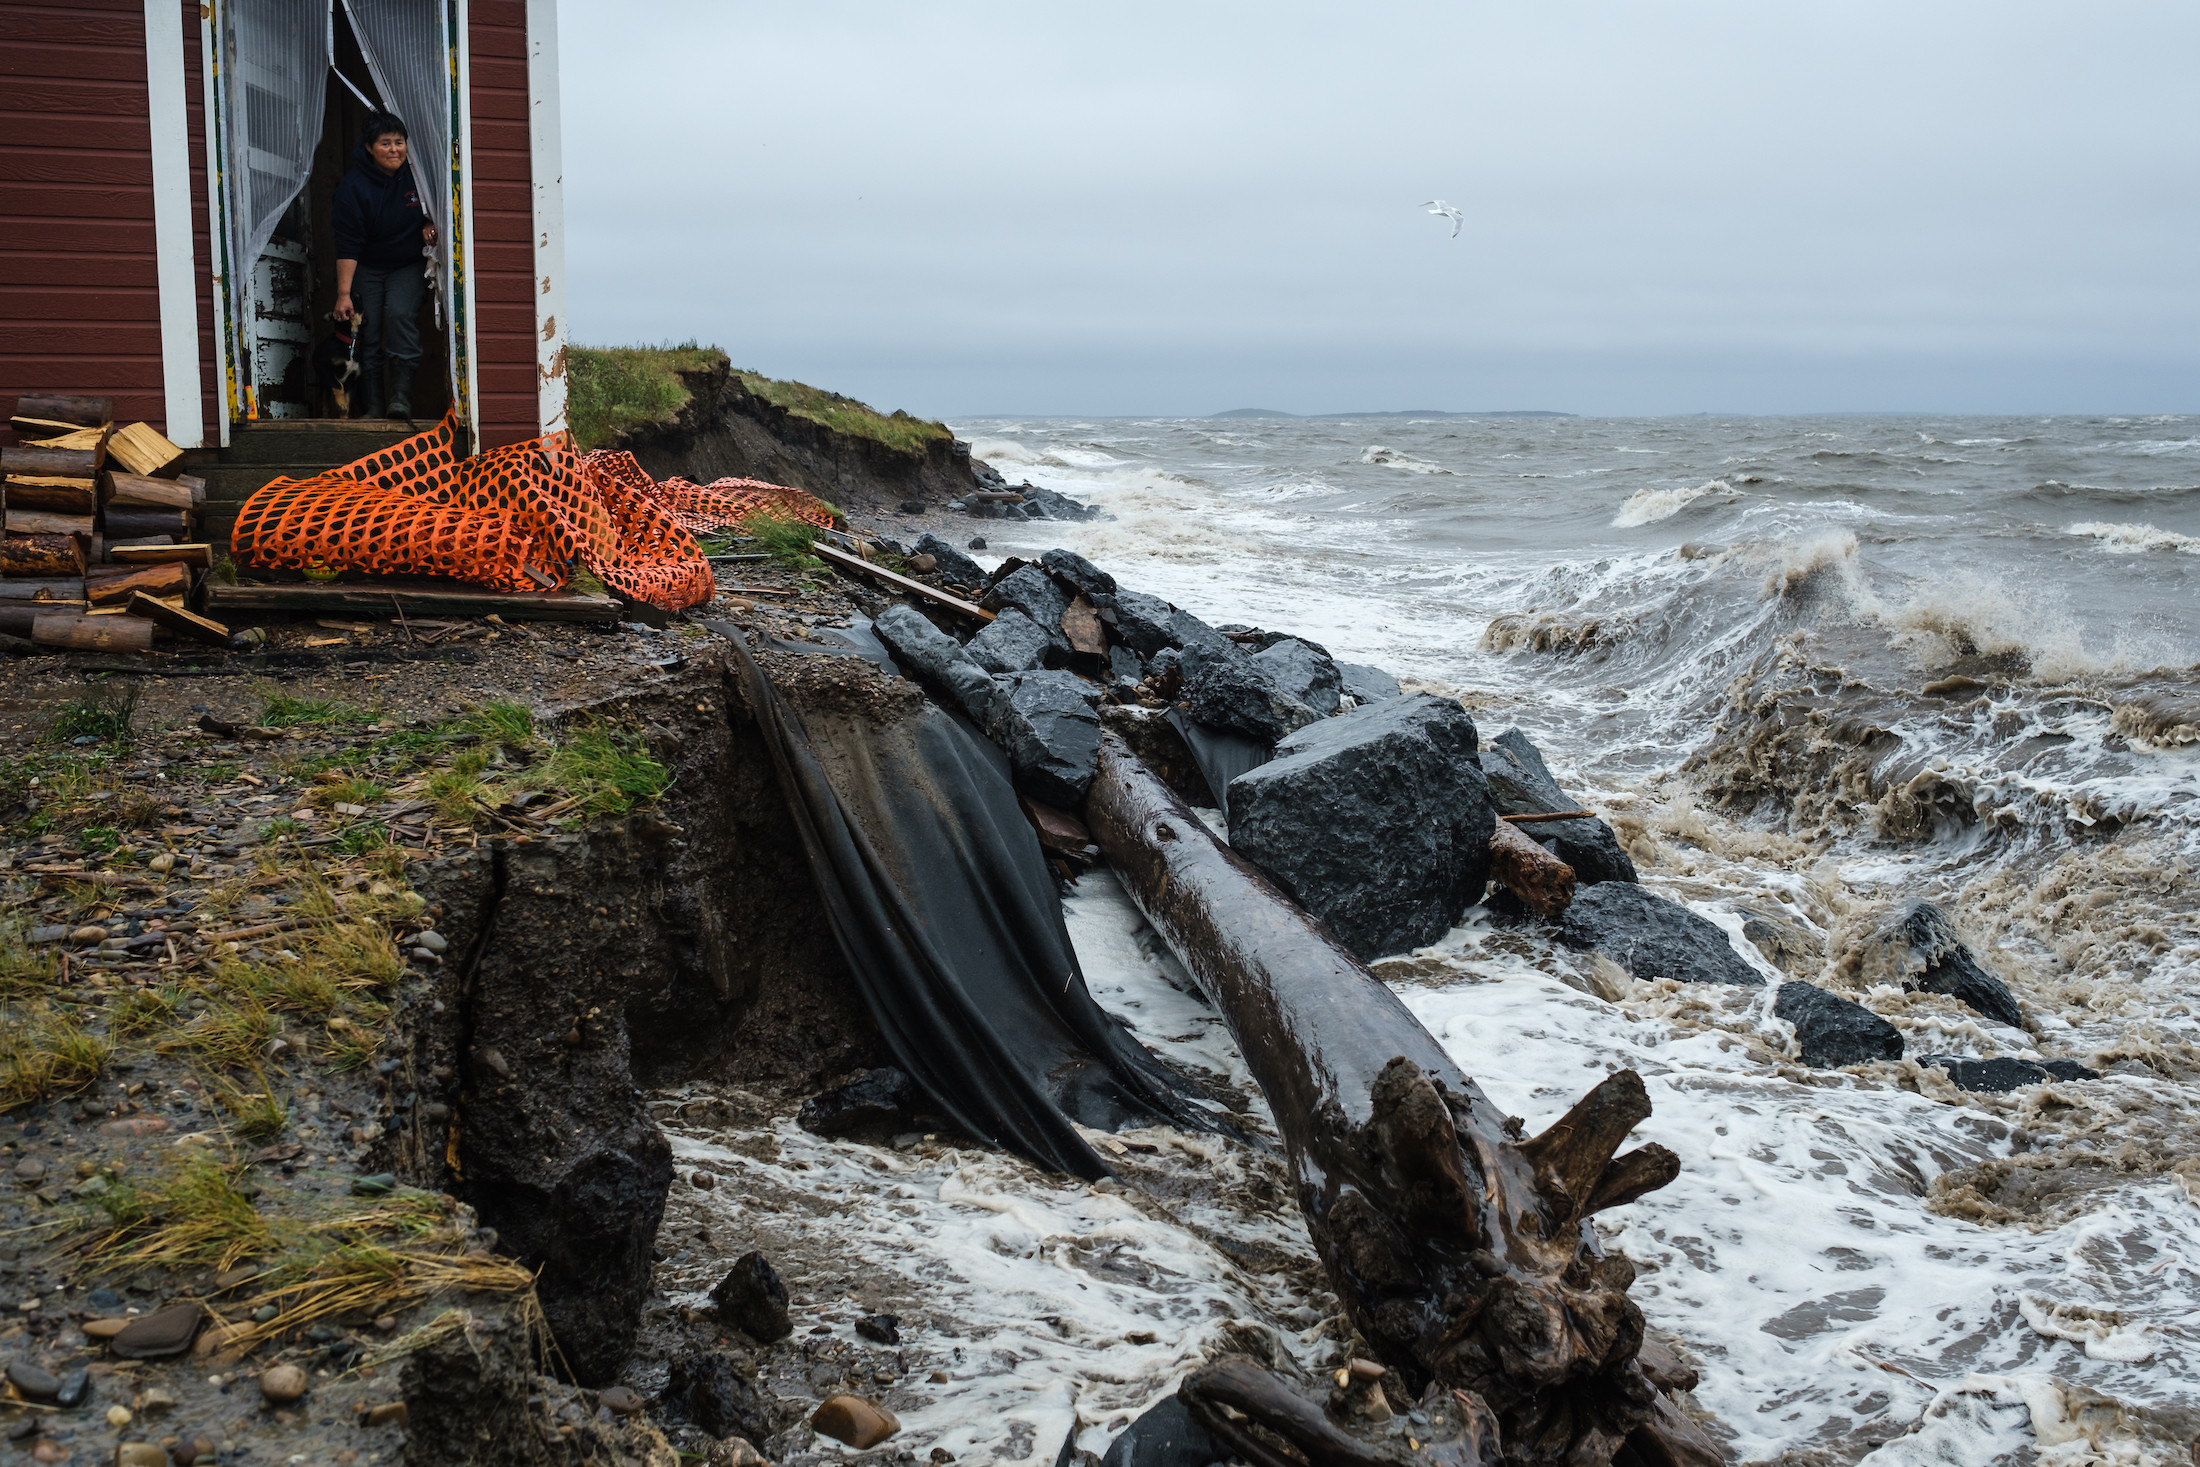 Climate Tuktoyaktuk The Point Coastal Erosion Weronika Murray